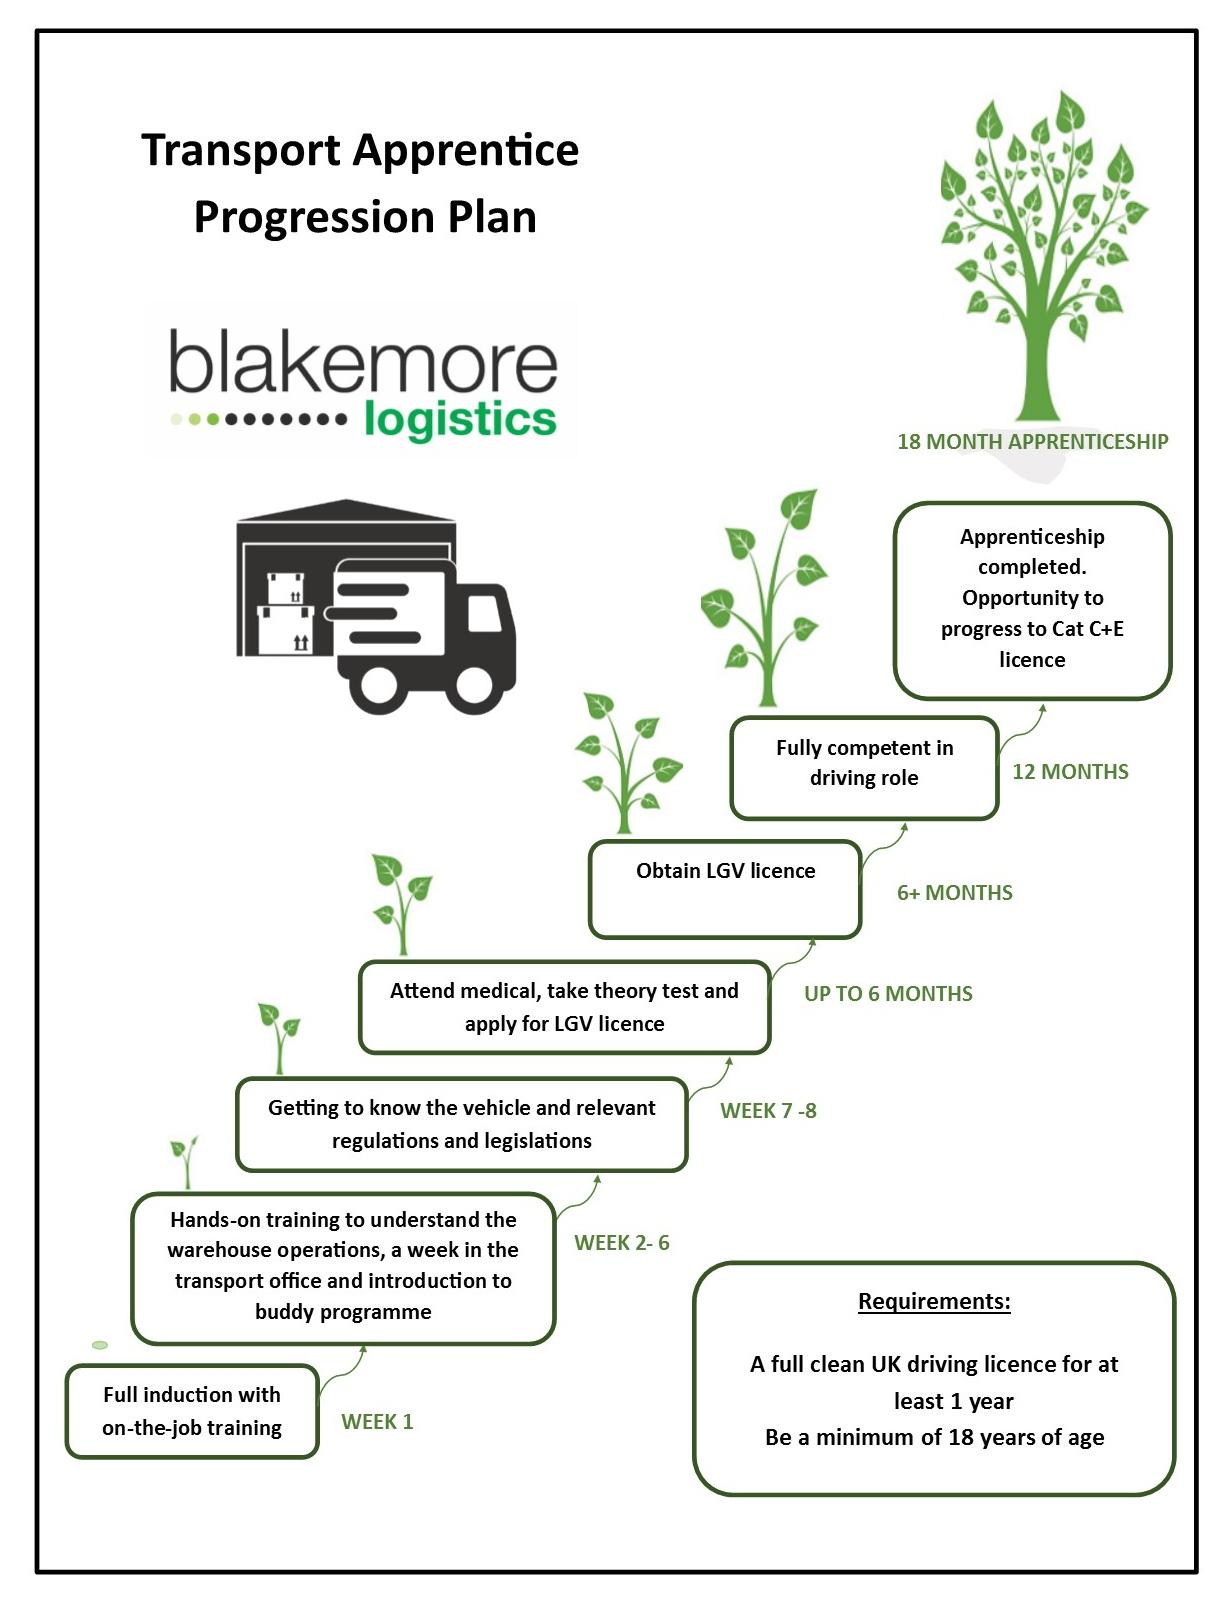 Transport_Apprentice_Progression_Plan